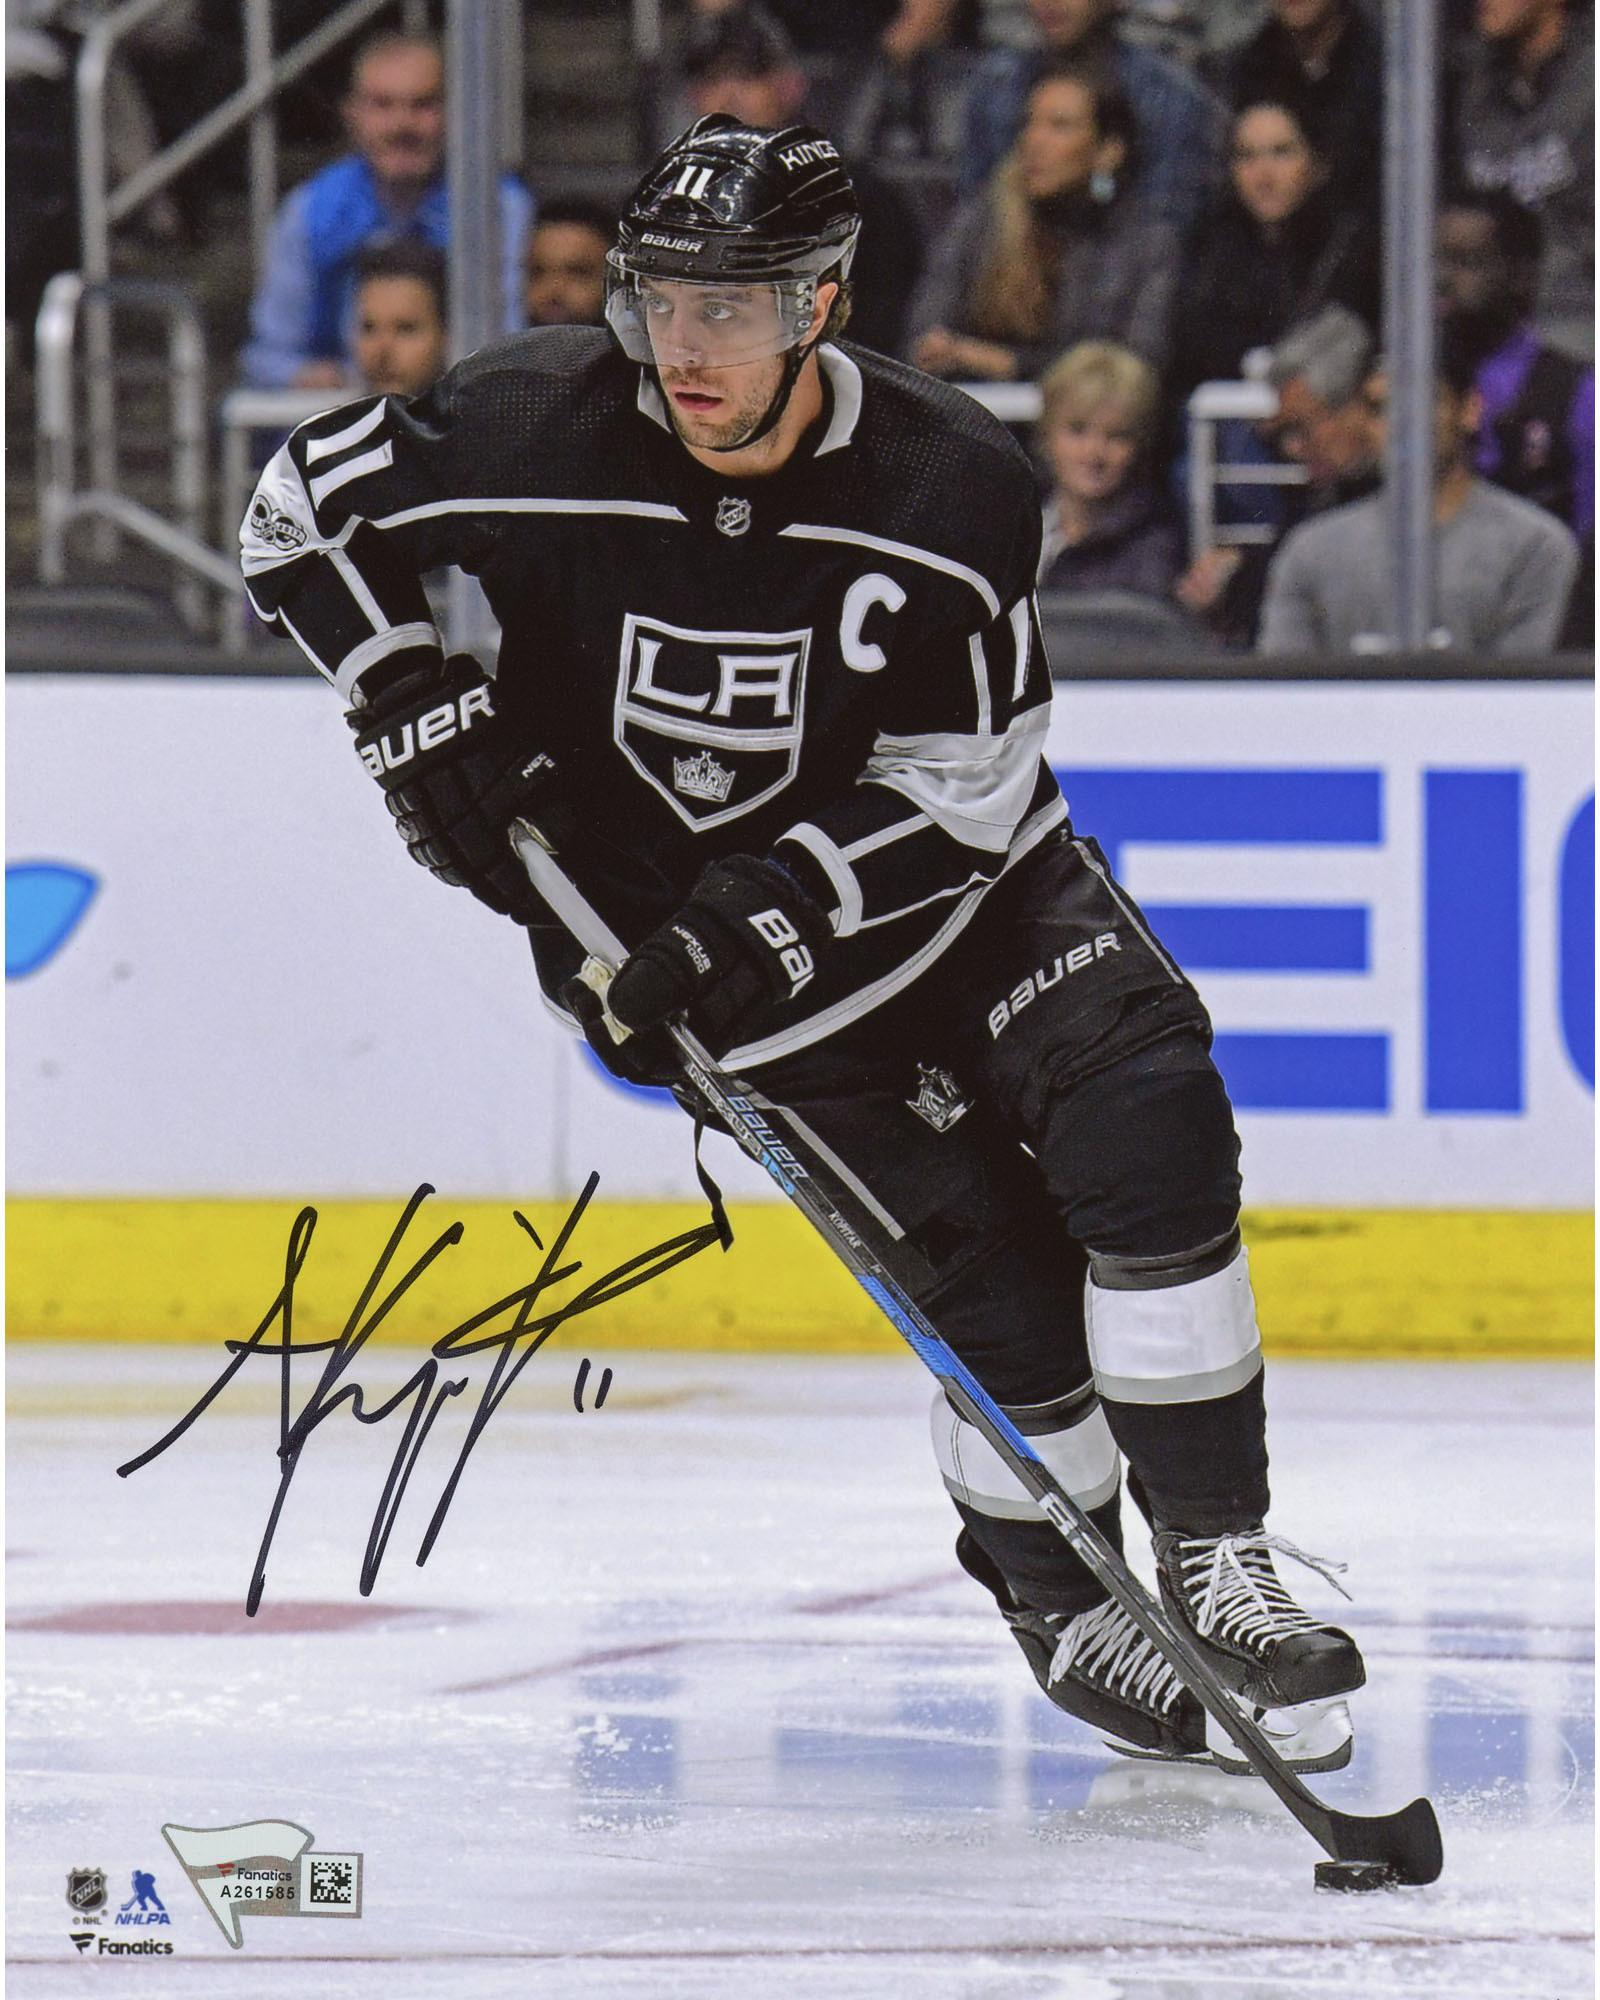 "Anze Kopitar Los Angeles Kings Autographed 8"" x 10"" Black Jersey Skating Photograph Fanatics Authentic... by Fanatics Authentic"